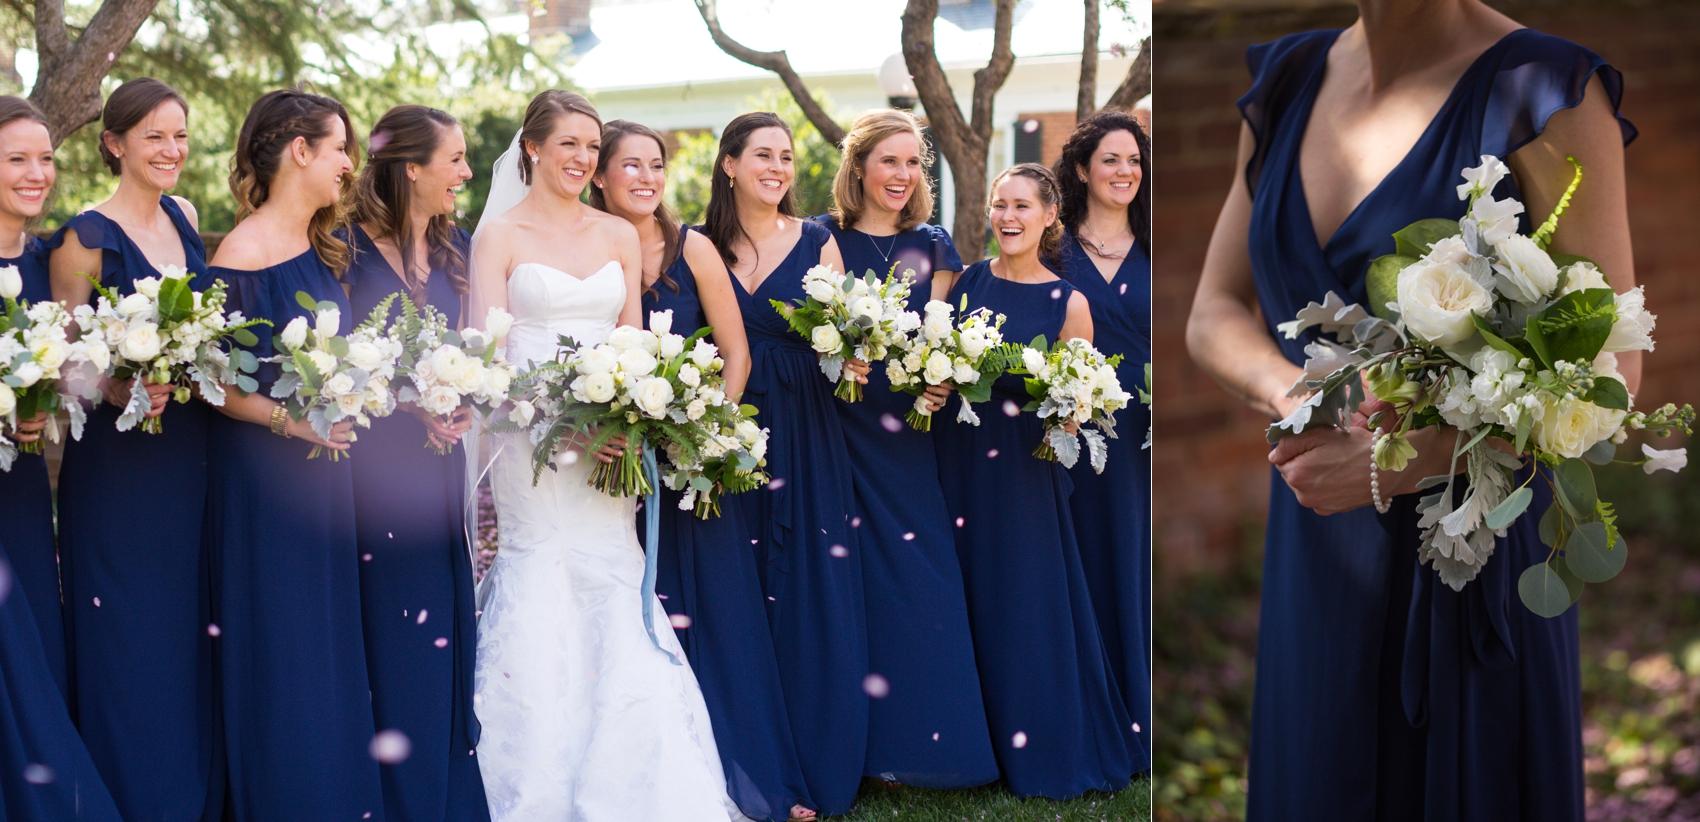 Castle-Hill-Virginia-Wedding-2019-0512.jpg